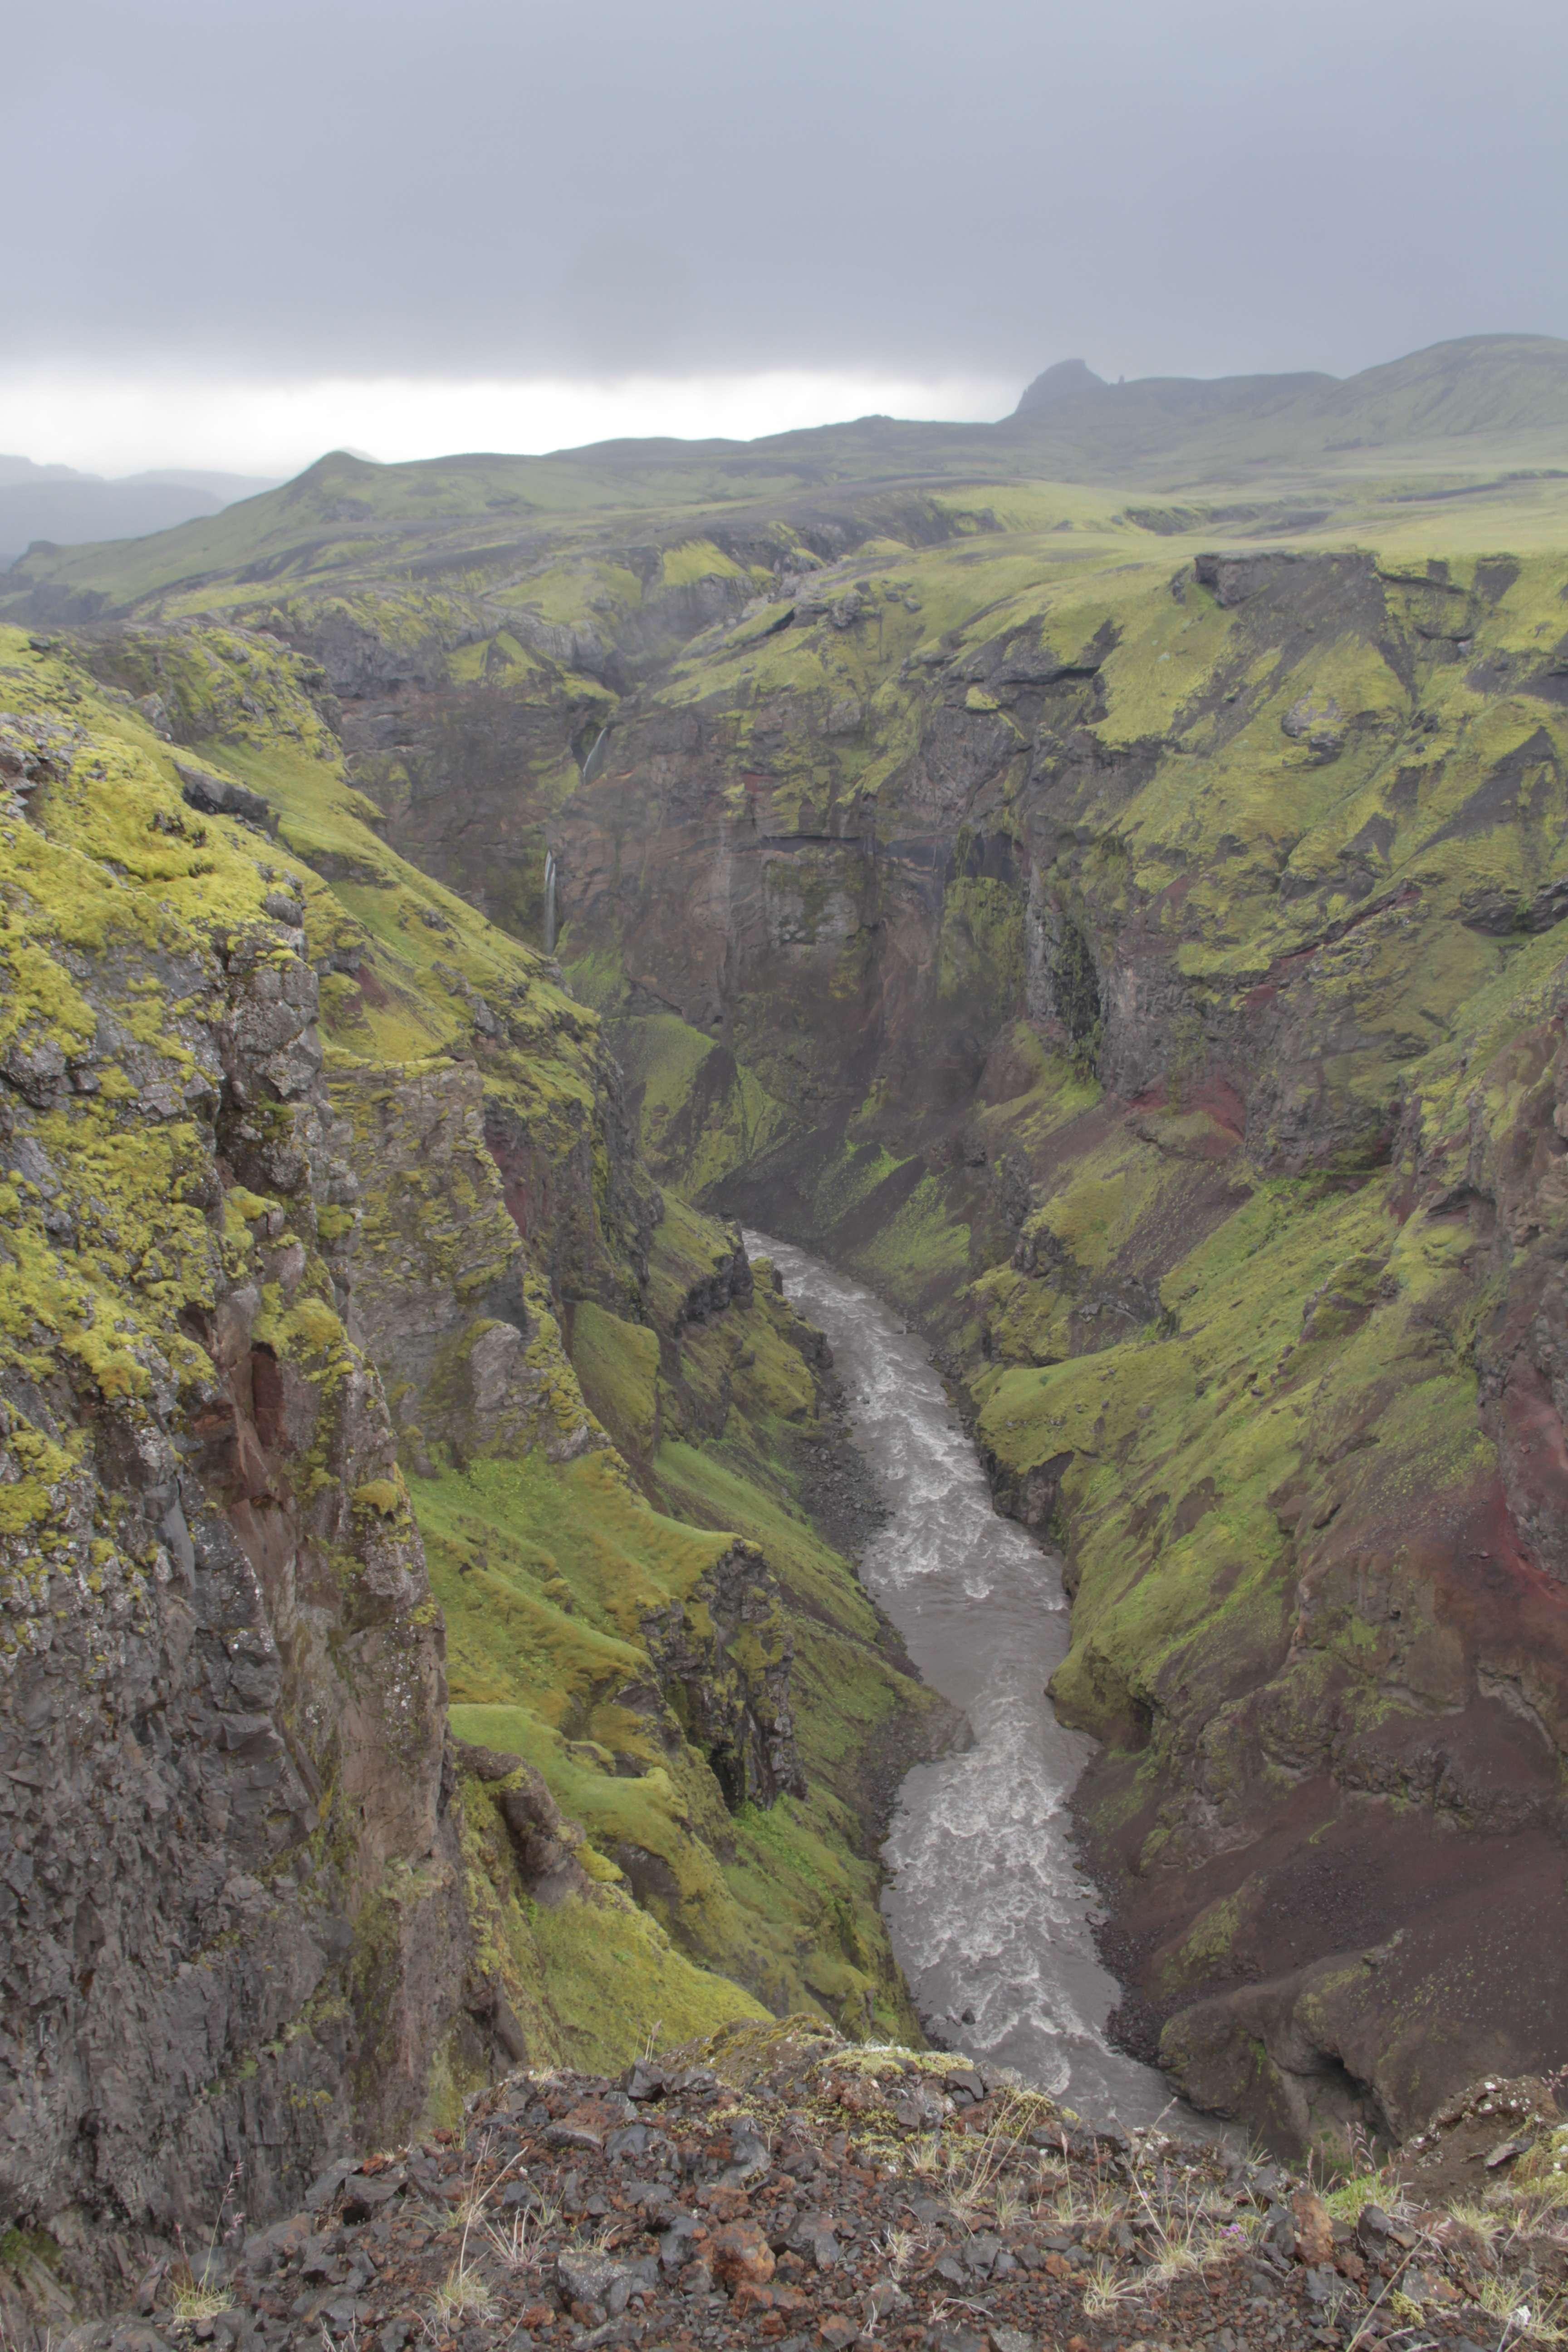 Islande_0594 trail jour 2 Emstrur - le canyon Markatflojogur 18 juillet